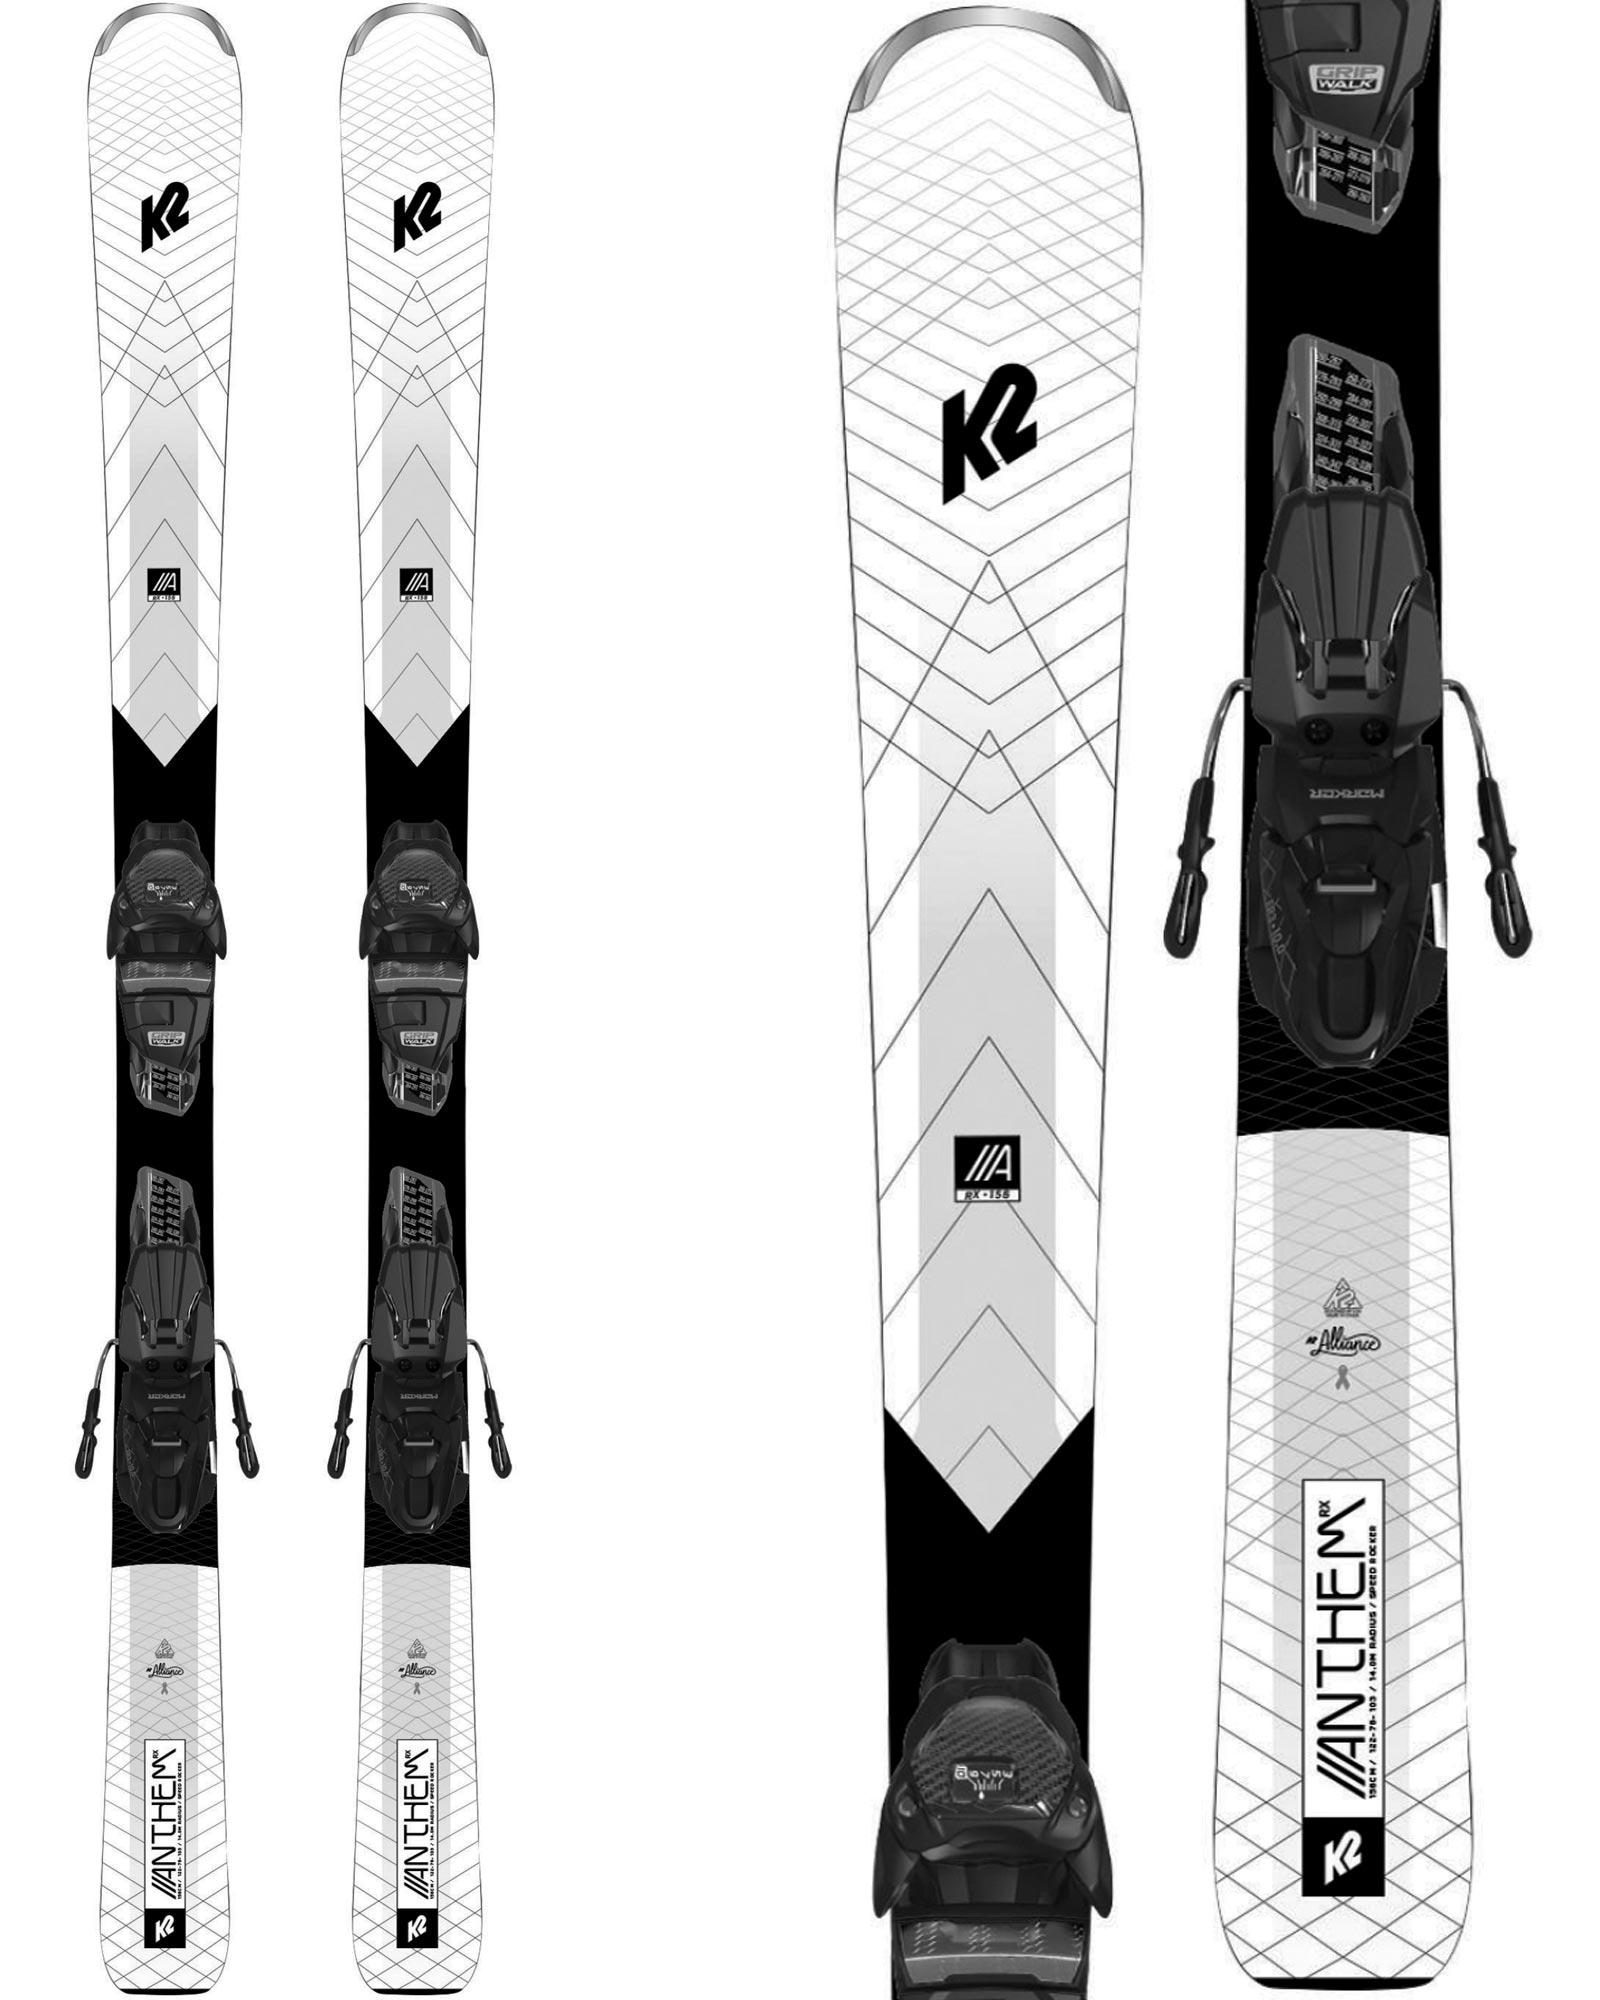 K2 Women's Anthem 74RX Piste Skis + ER3 10 Compact Quikclik Bindings 2020 / 2021 0